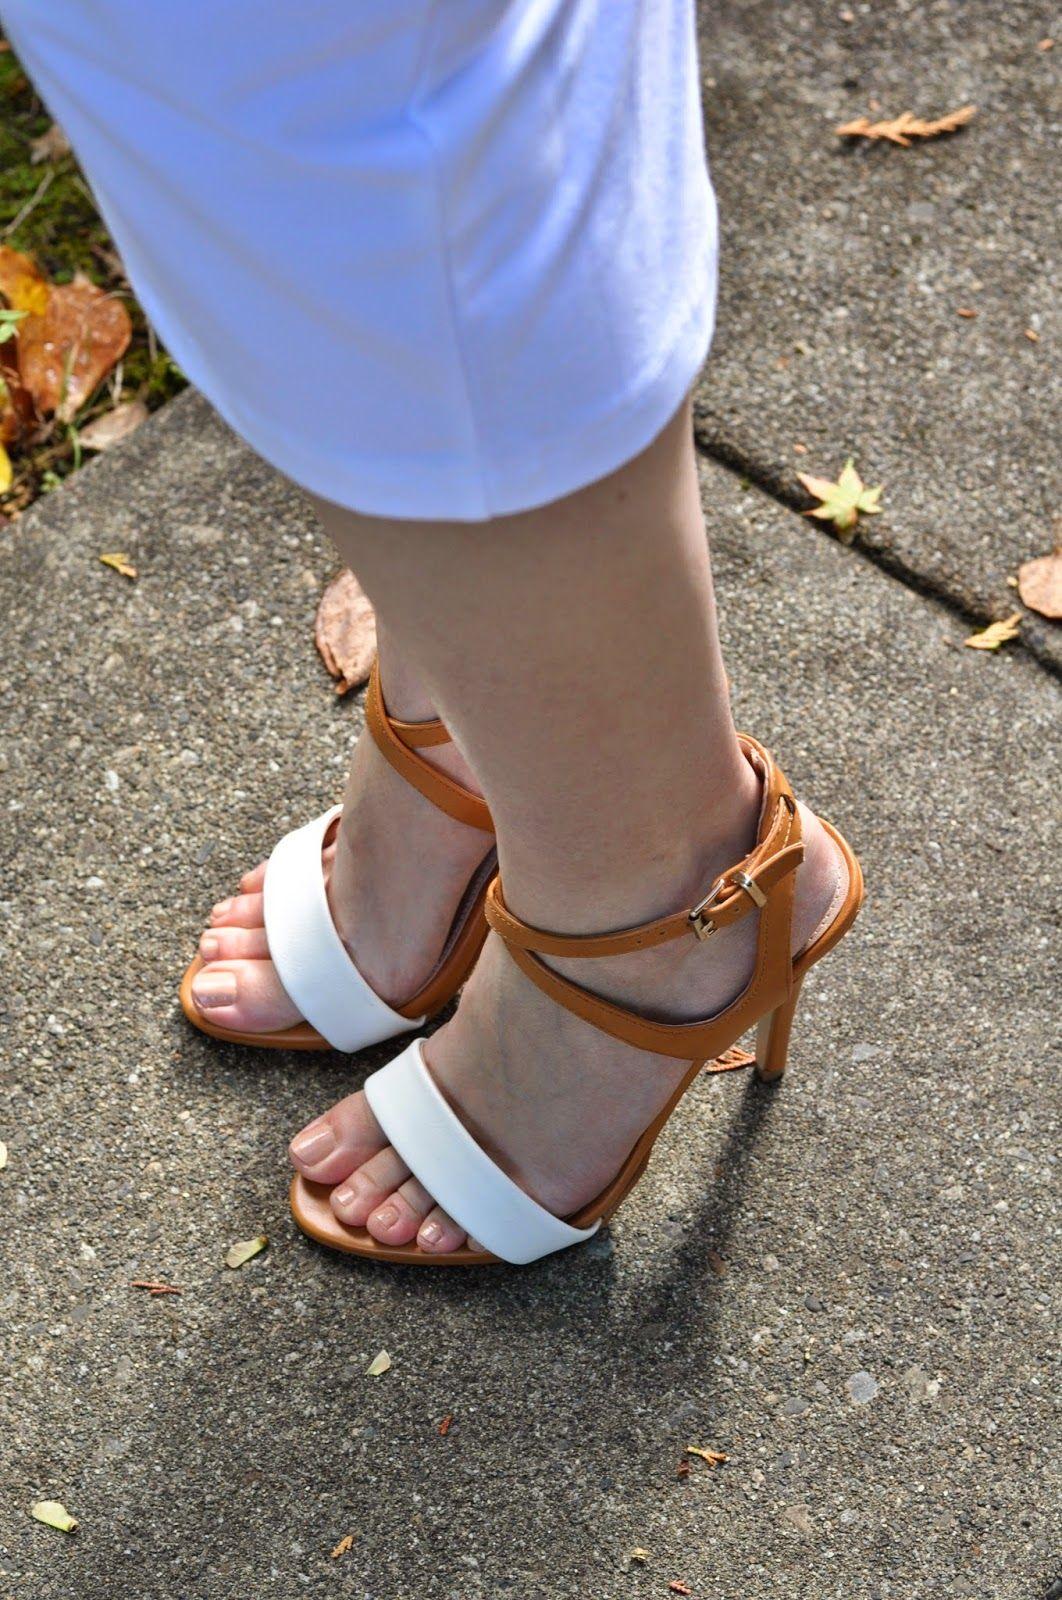 tan and white heels